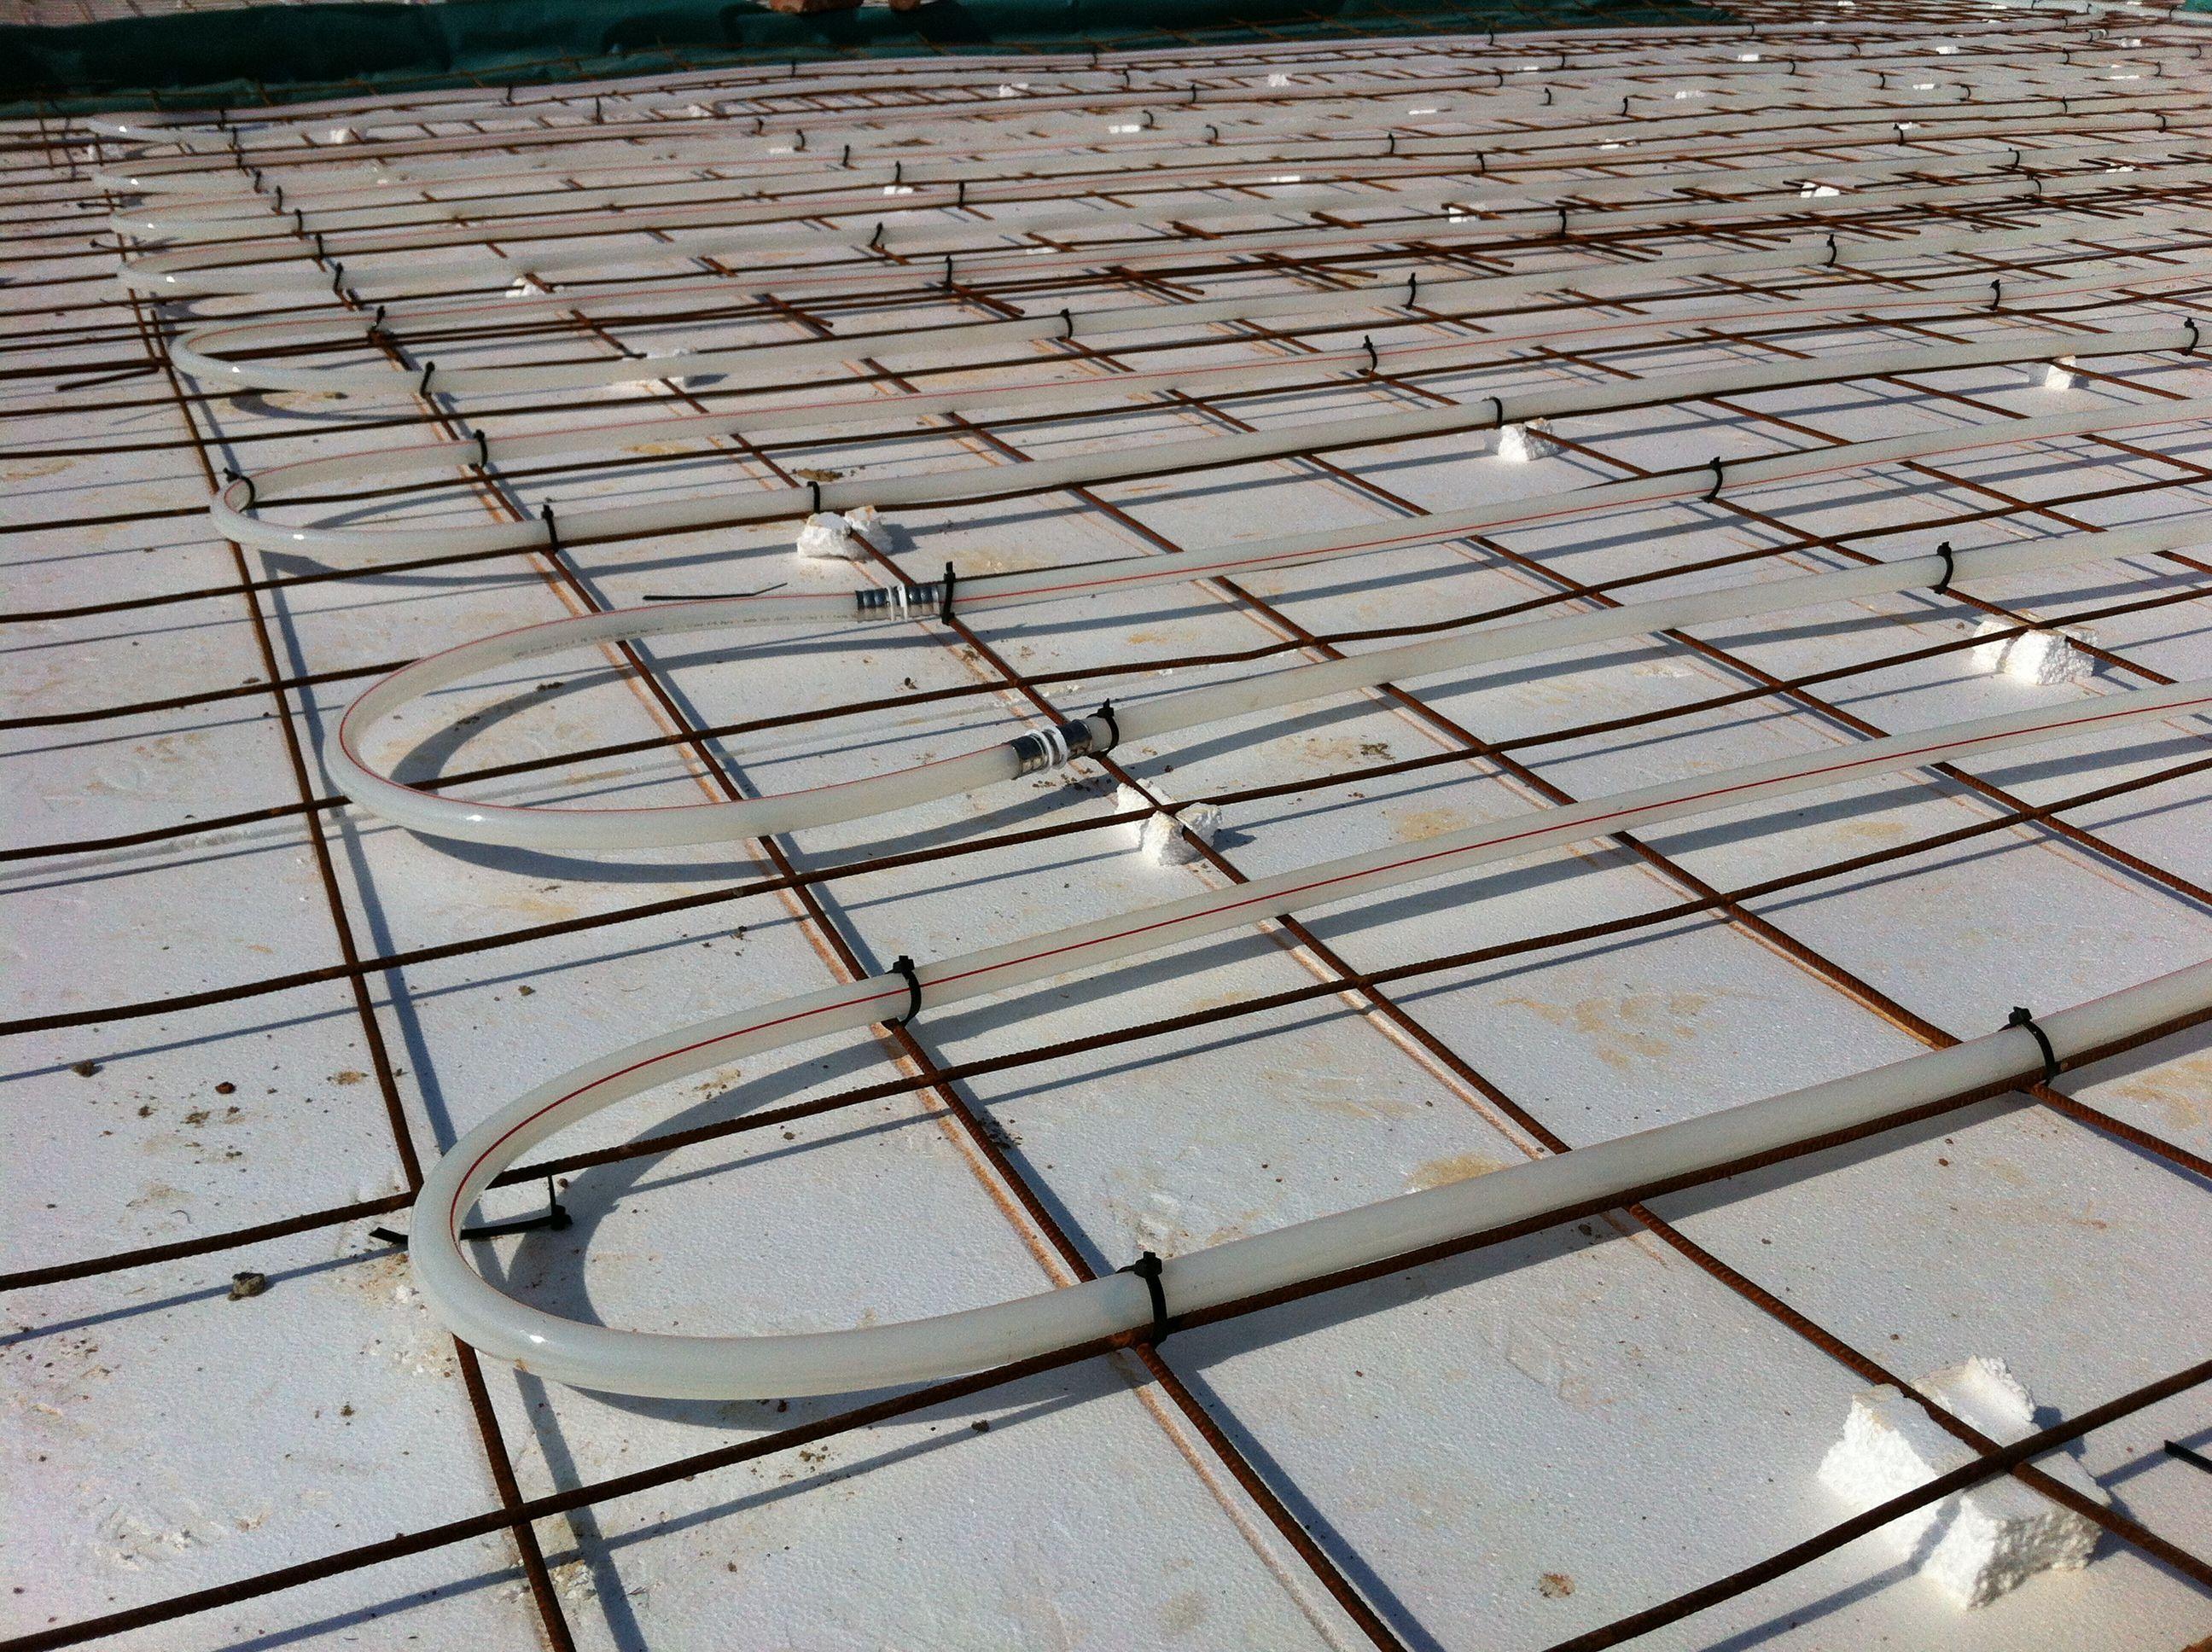 medium resolution of we added eco friendly underfloor heating hot water